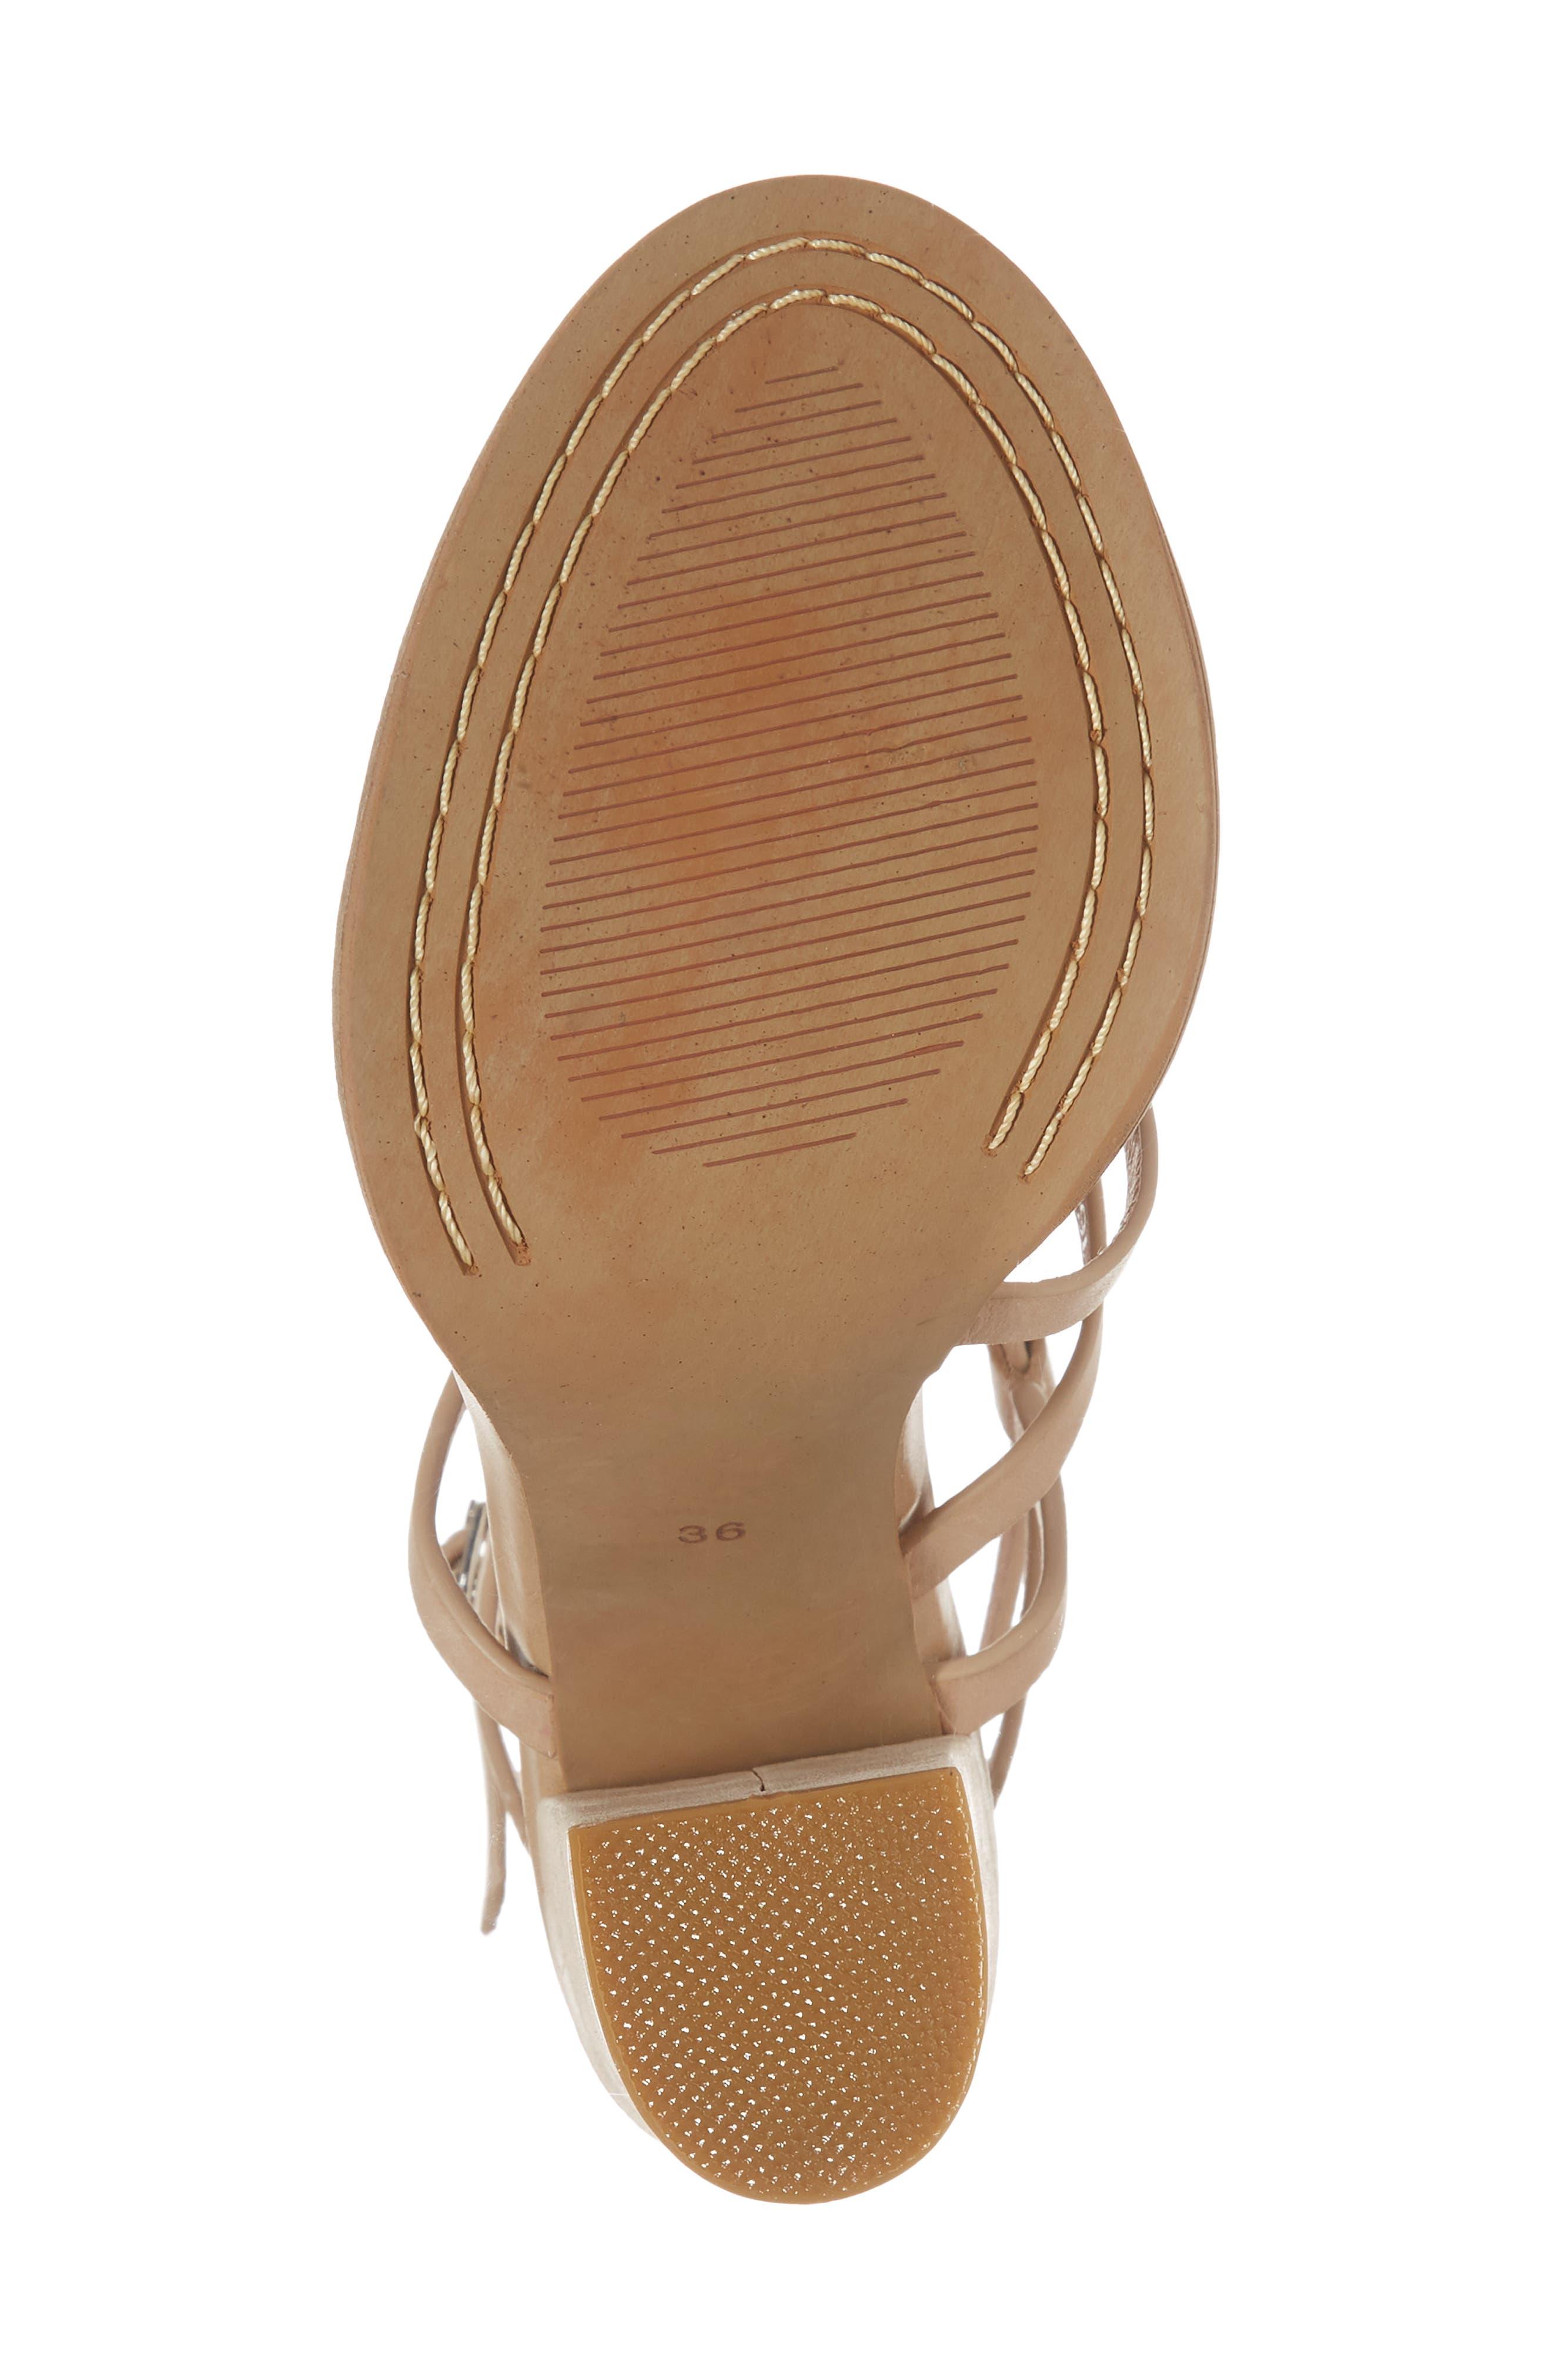 Jyve Asymmetrical Cross Strap Sandal,                             Alternate thumbnail 6, color,